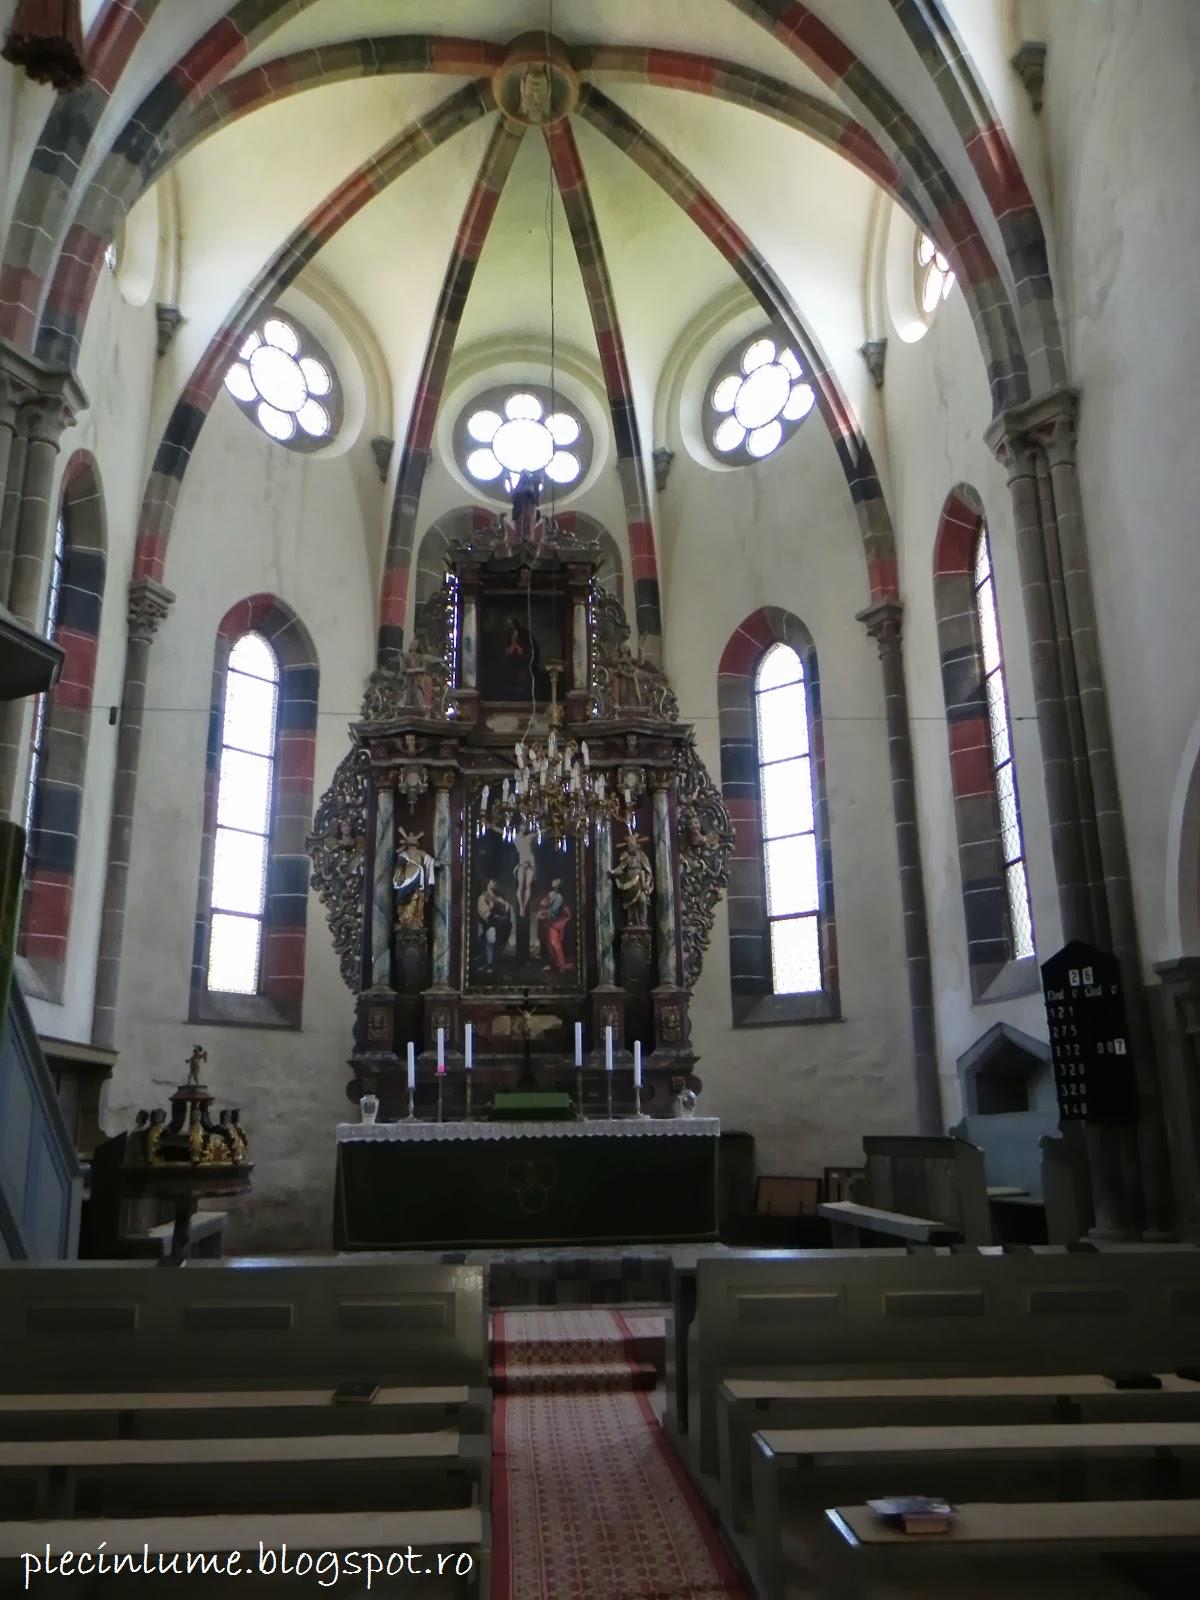 Biserica din Carta in interior